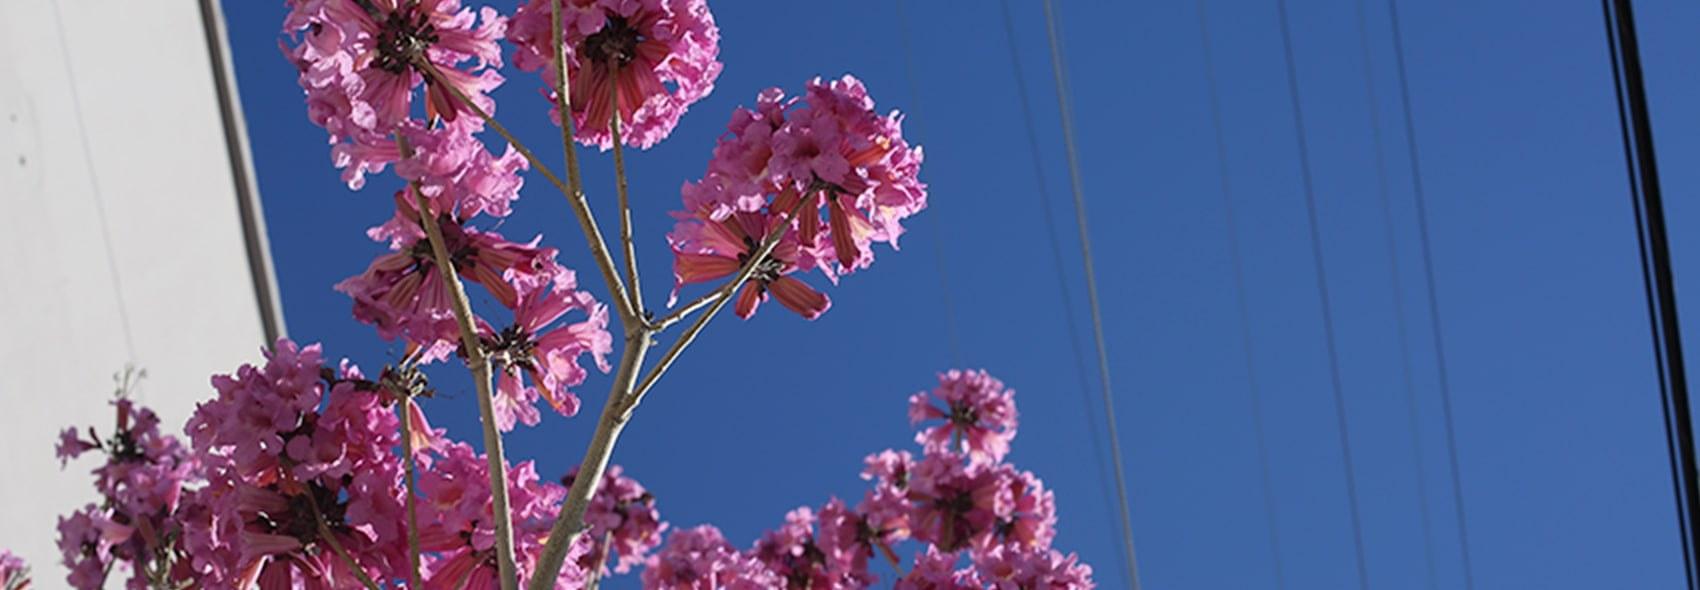 Plumper skin pink flower